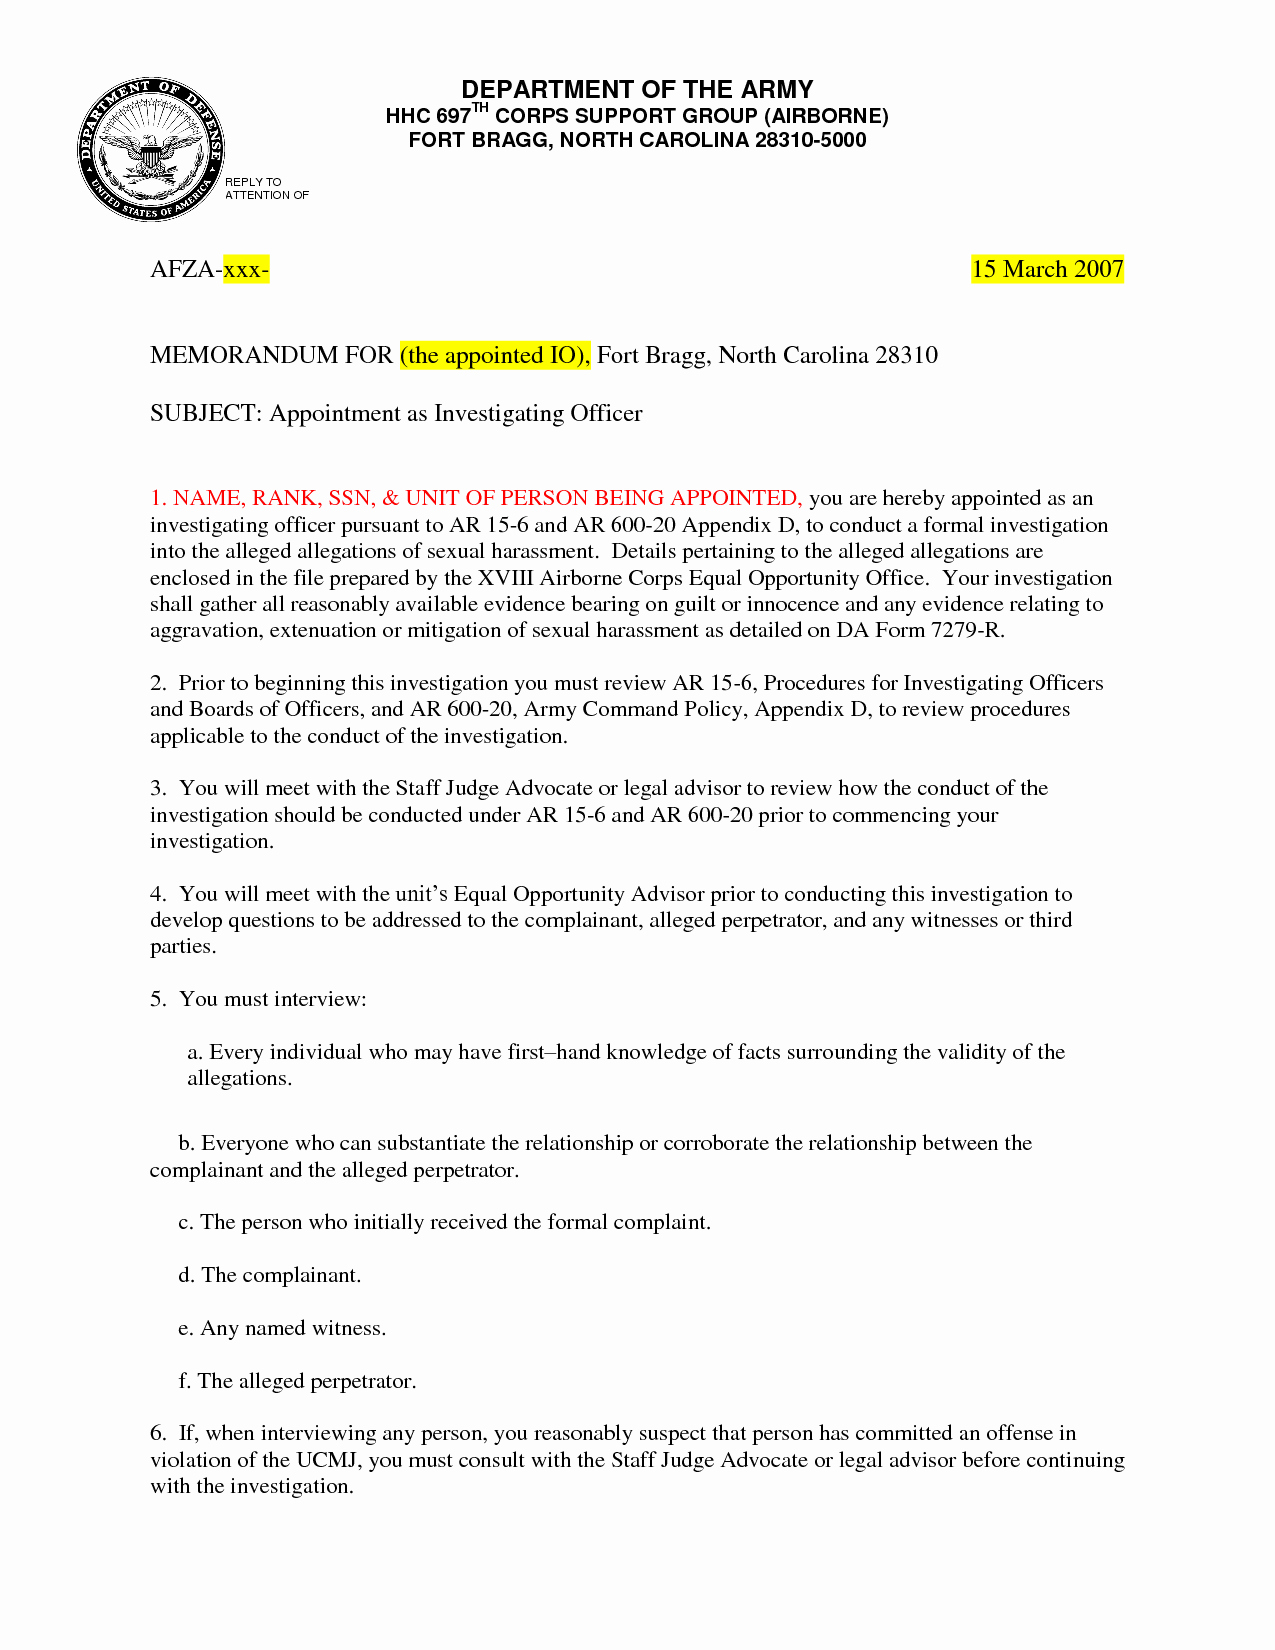 Army Memorandum for Record Template Luxury Army Memorandum Template